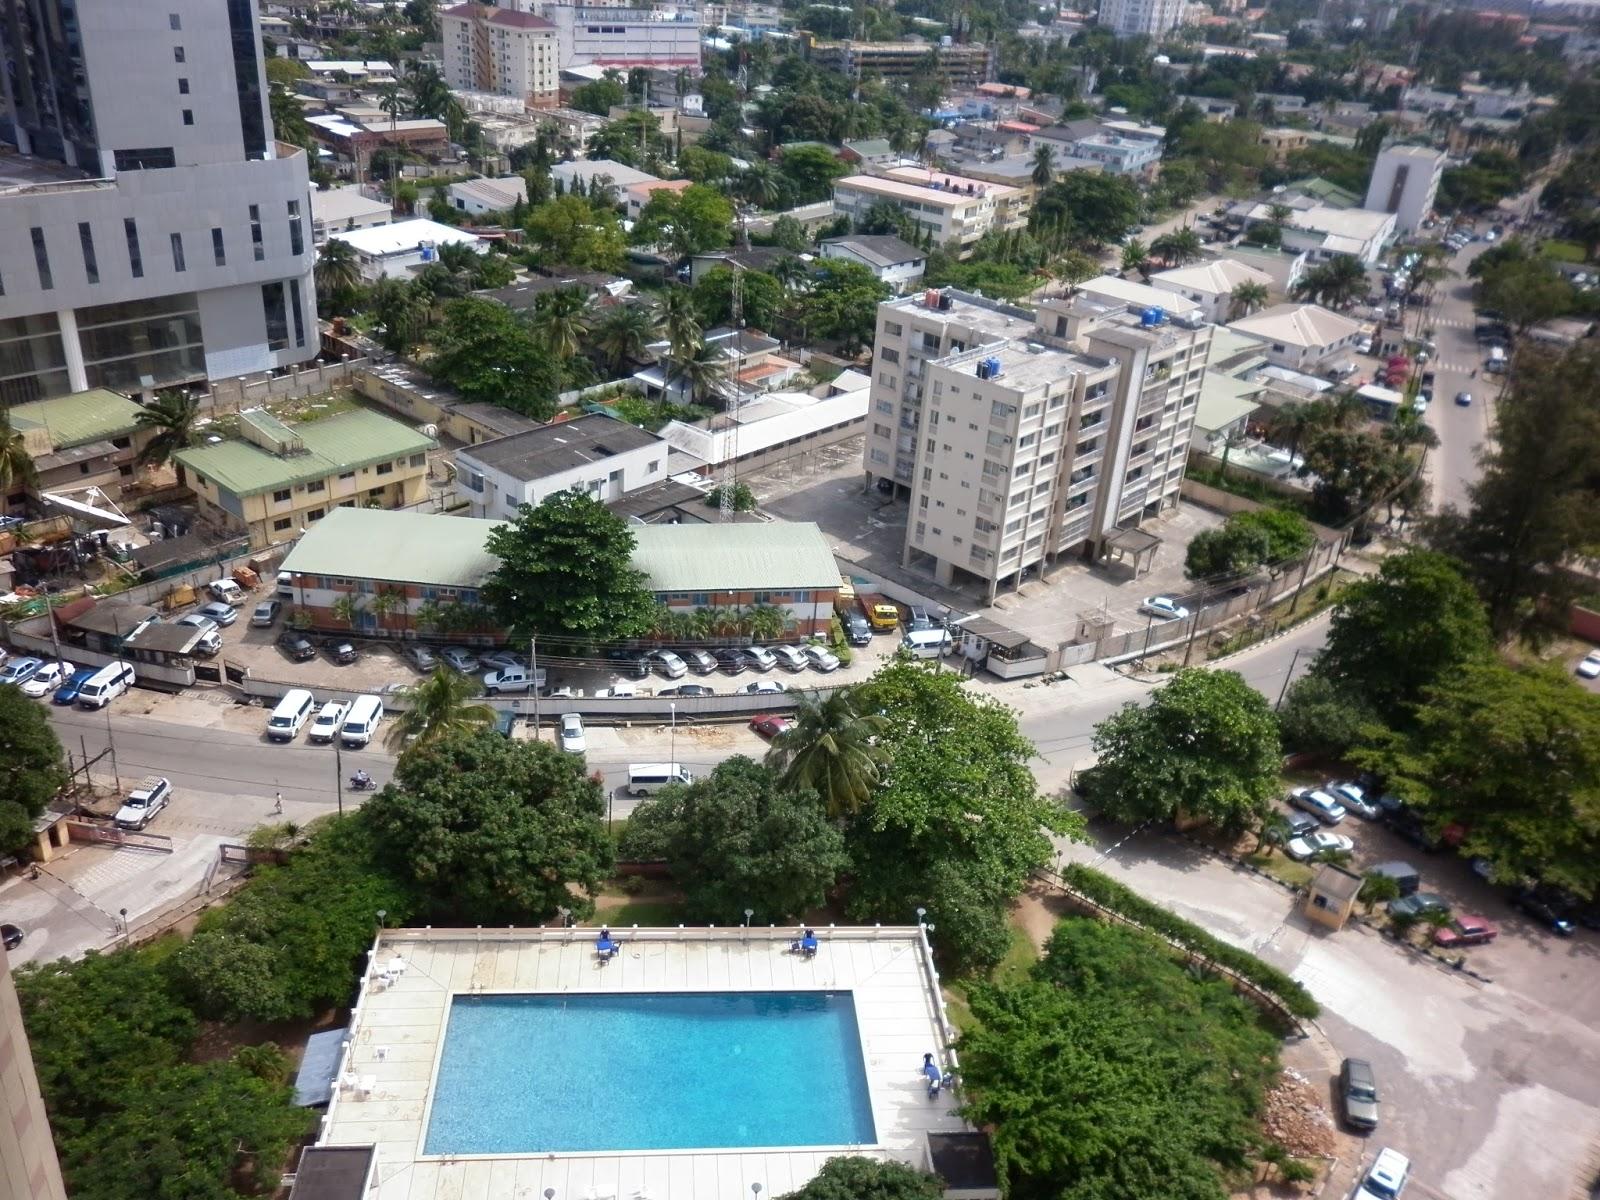 photos of nigeria a view of island lagos